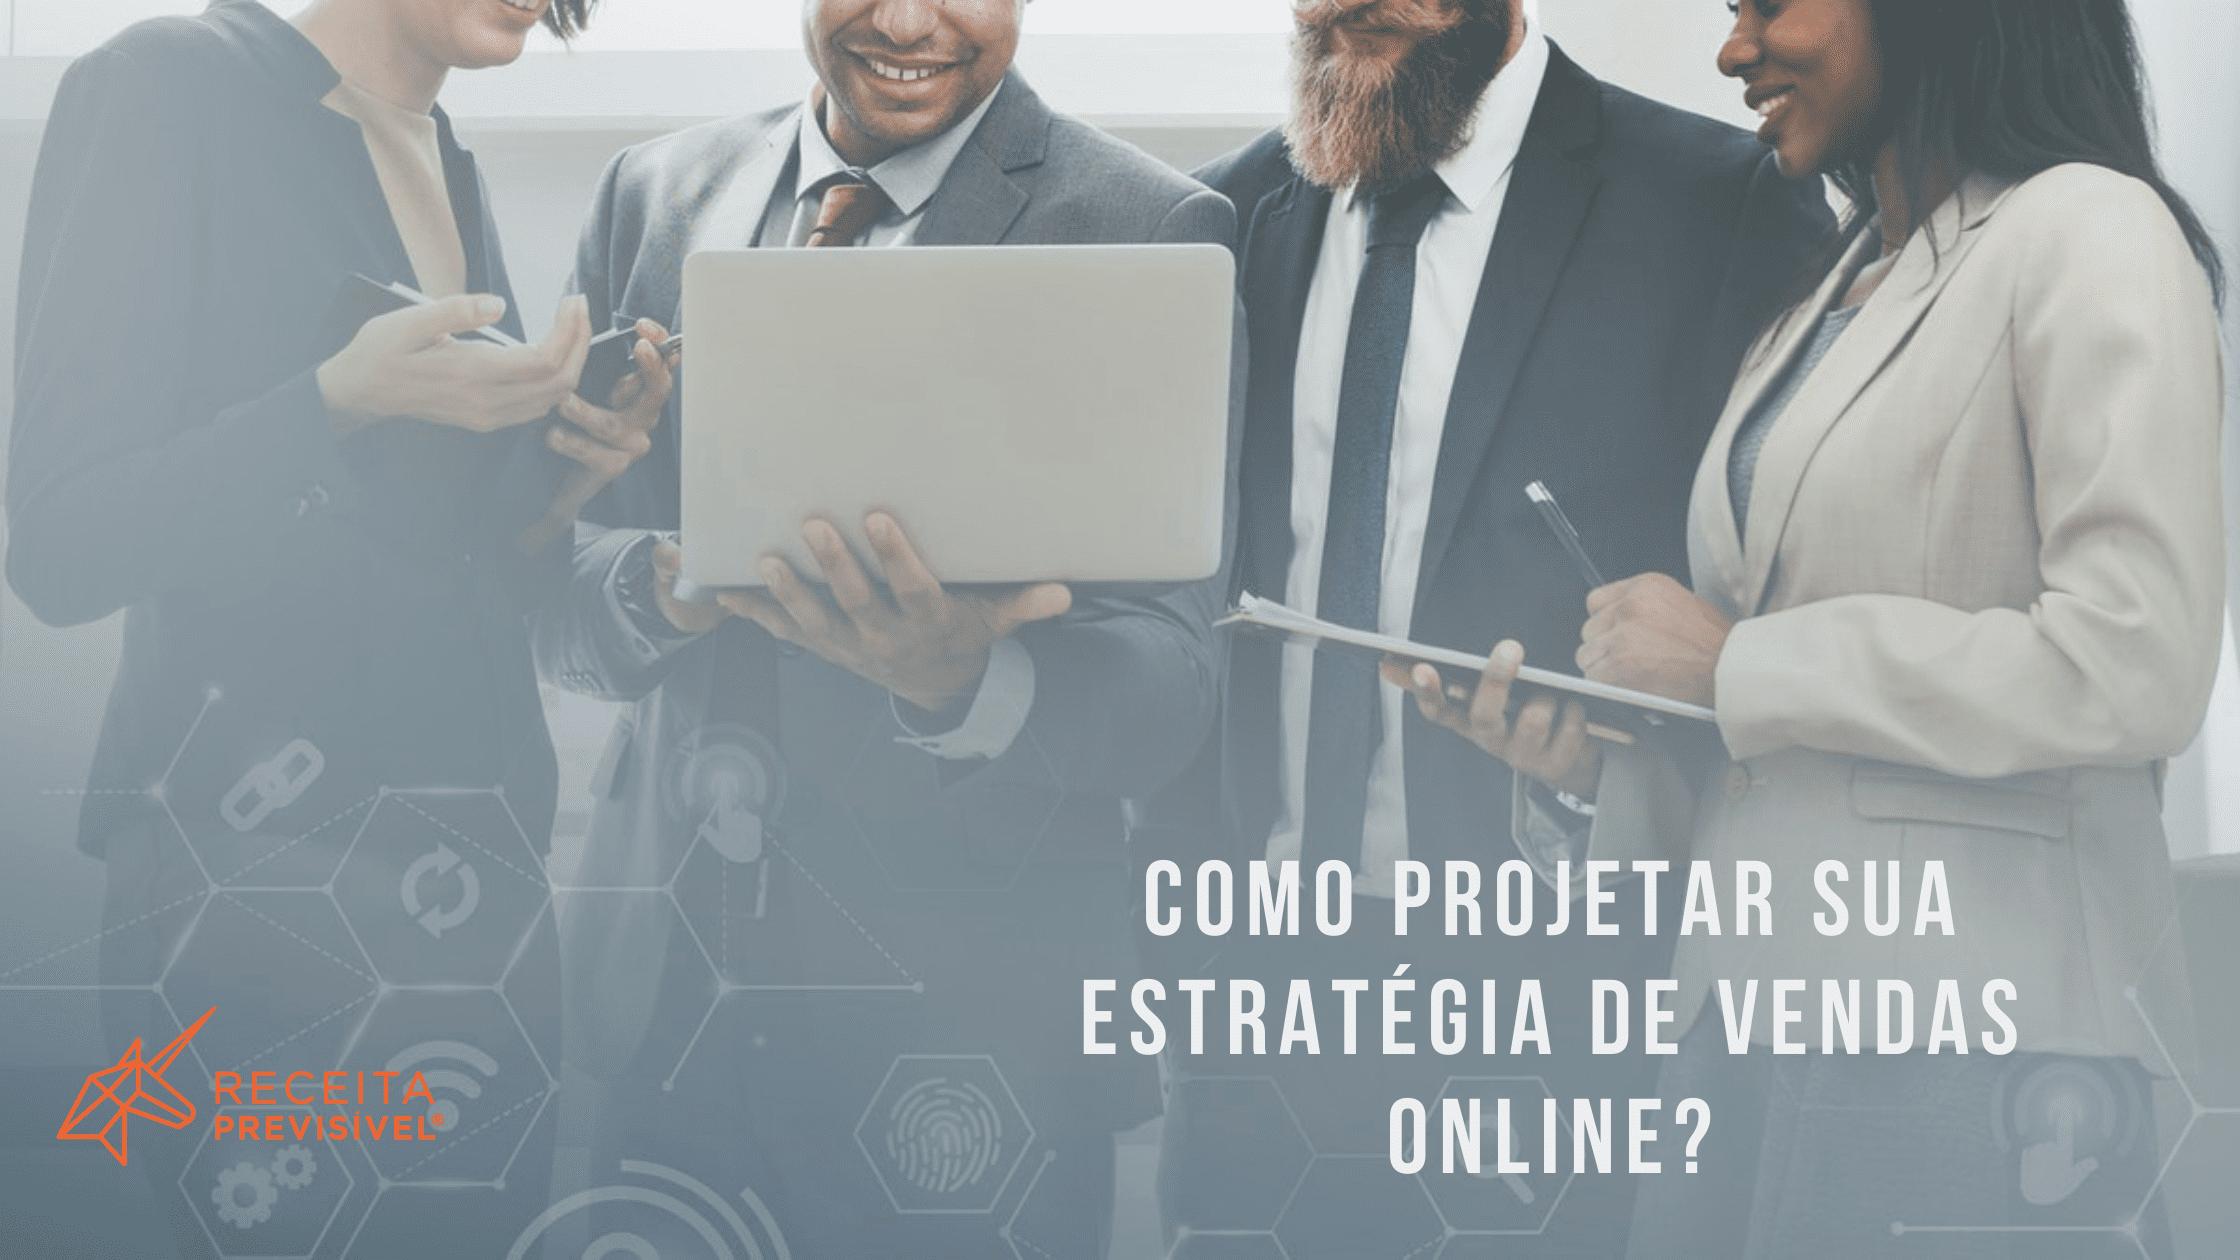 estrategia de vendas online